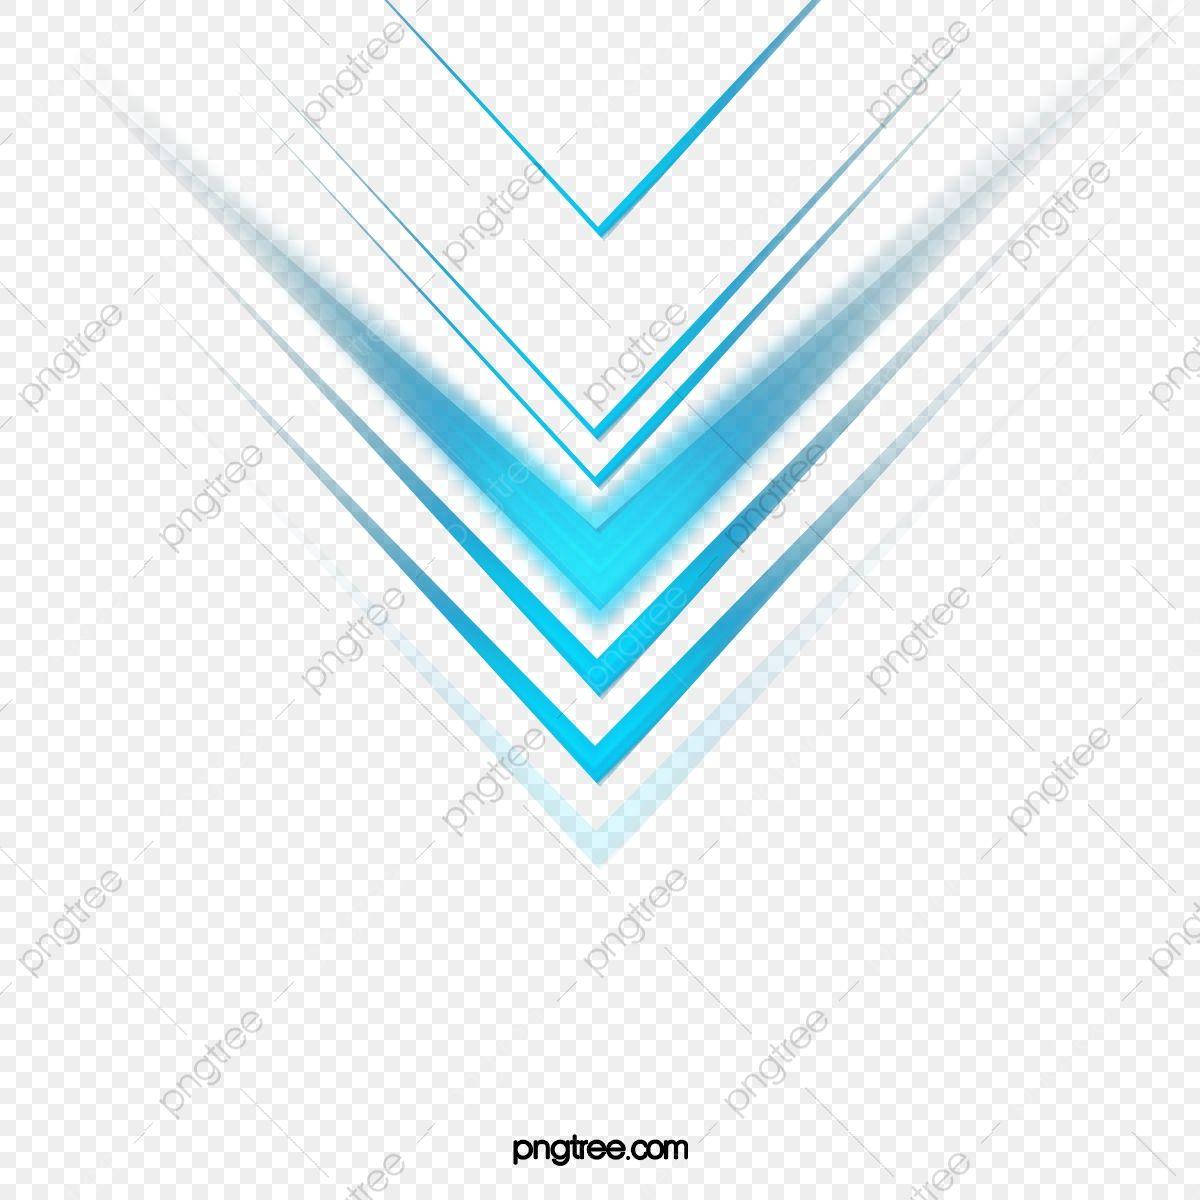 Arrow Blue Light Effect Kejizhiguang Science Fiction Arrow Png Transparent Clipart Image And Psd File For Free Download Clip Art Geometric Background Clipart Images